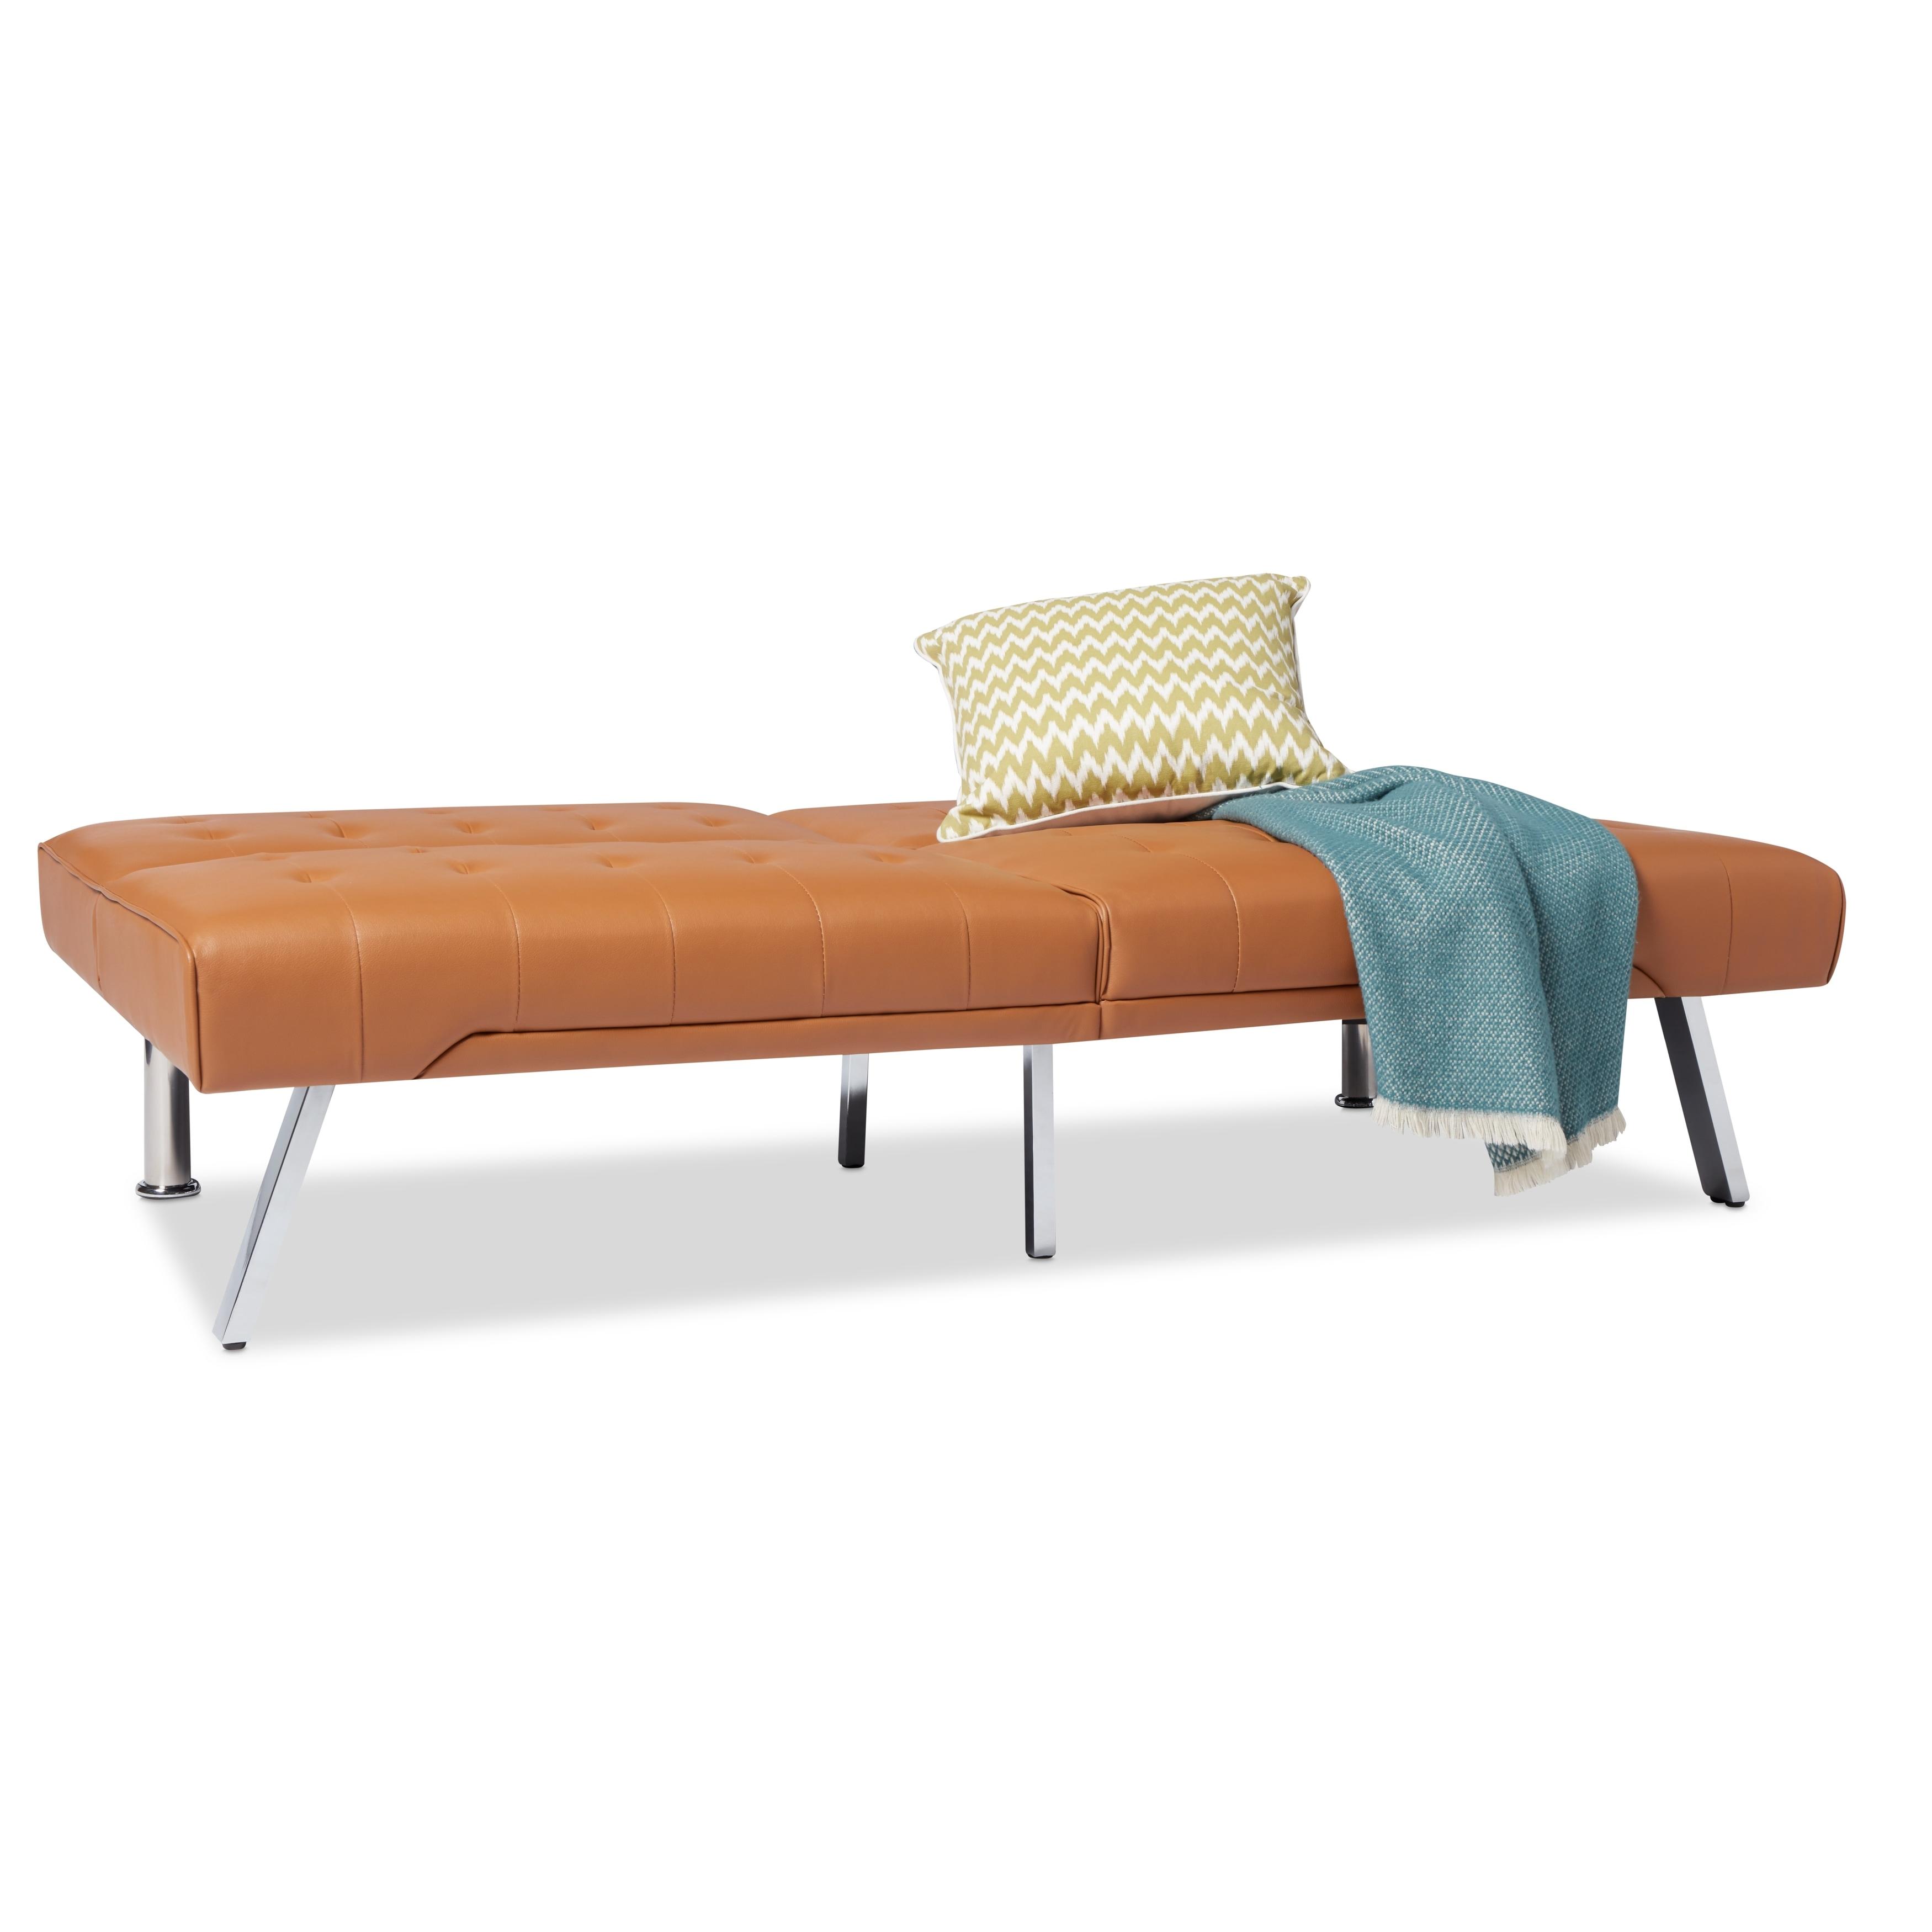 Abbyson Jackson Camel Leather Foldable Futon Sofa Bed Free